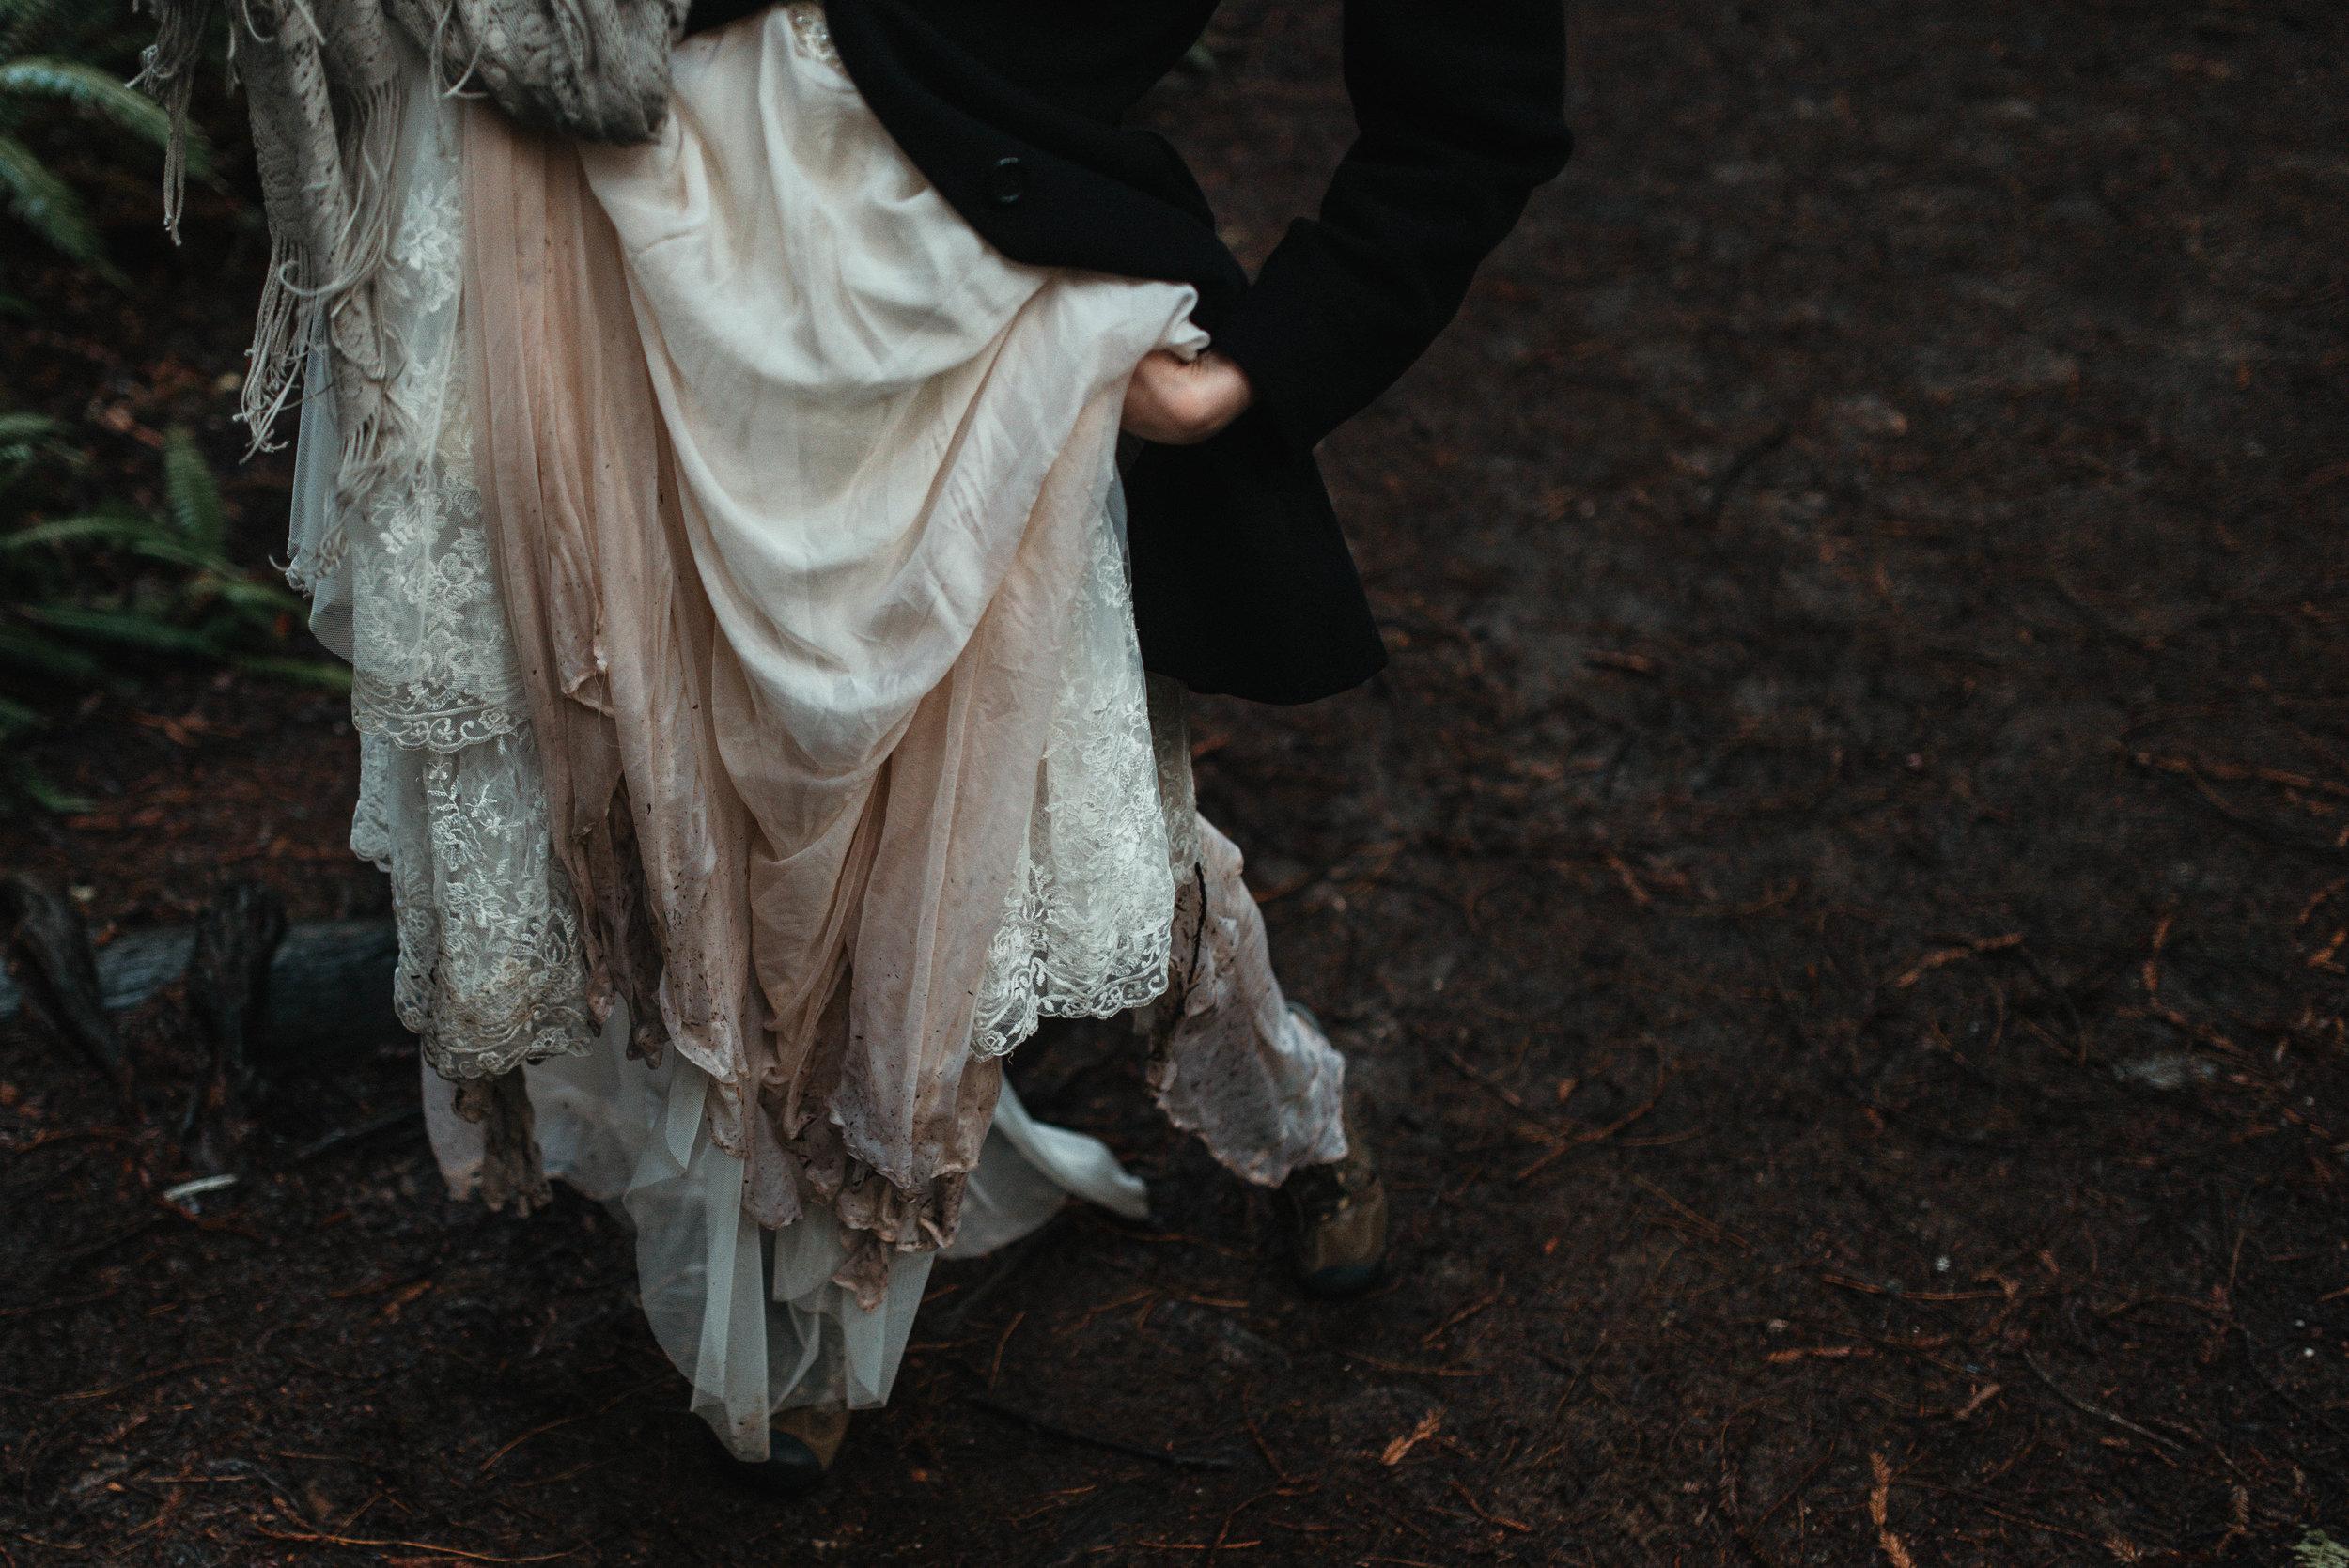 Intimiate Redwoods Elopement , Elopement Inspiration, Jessica Heron Images, Northern California Elopement, Oregon Elopement, Oregon Wedding, Elopement Ideas, Oregon Wedding